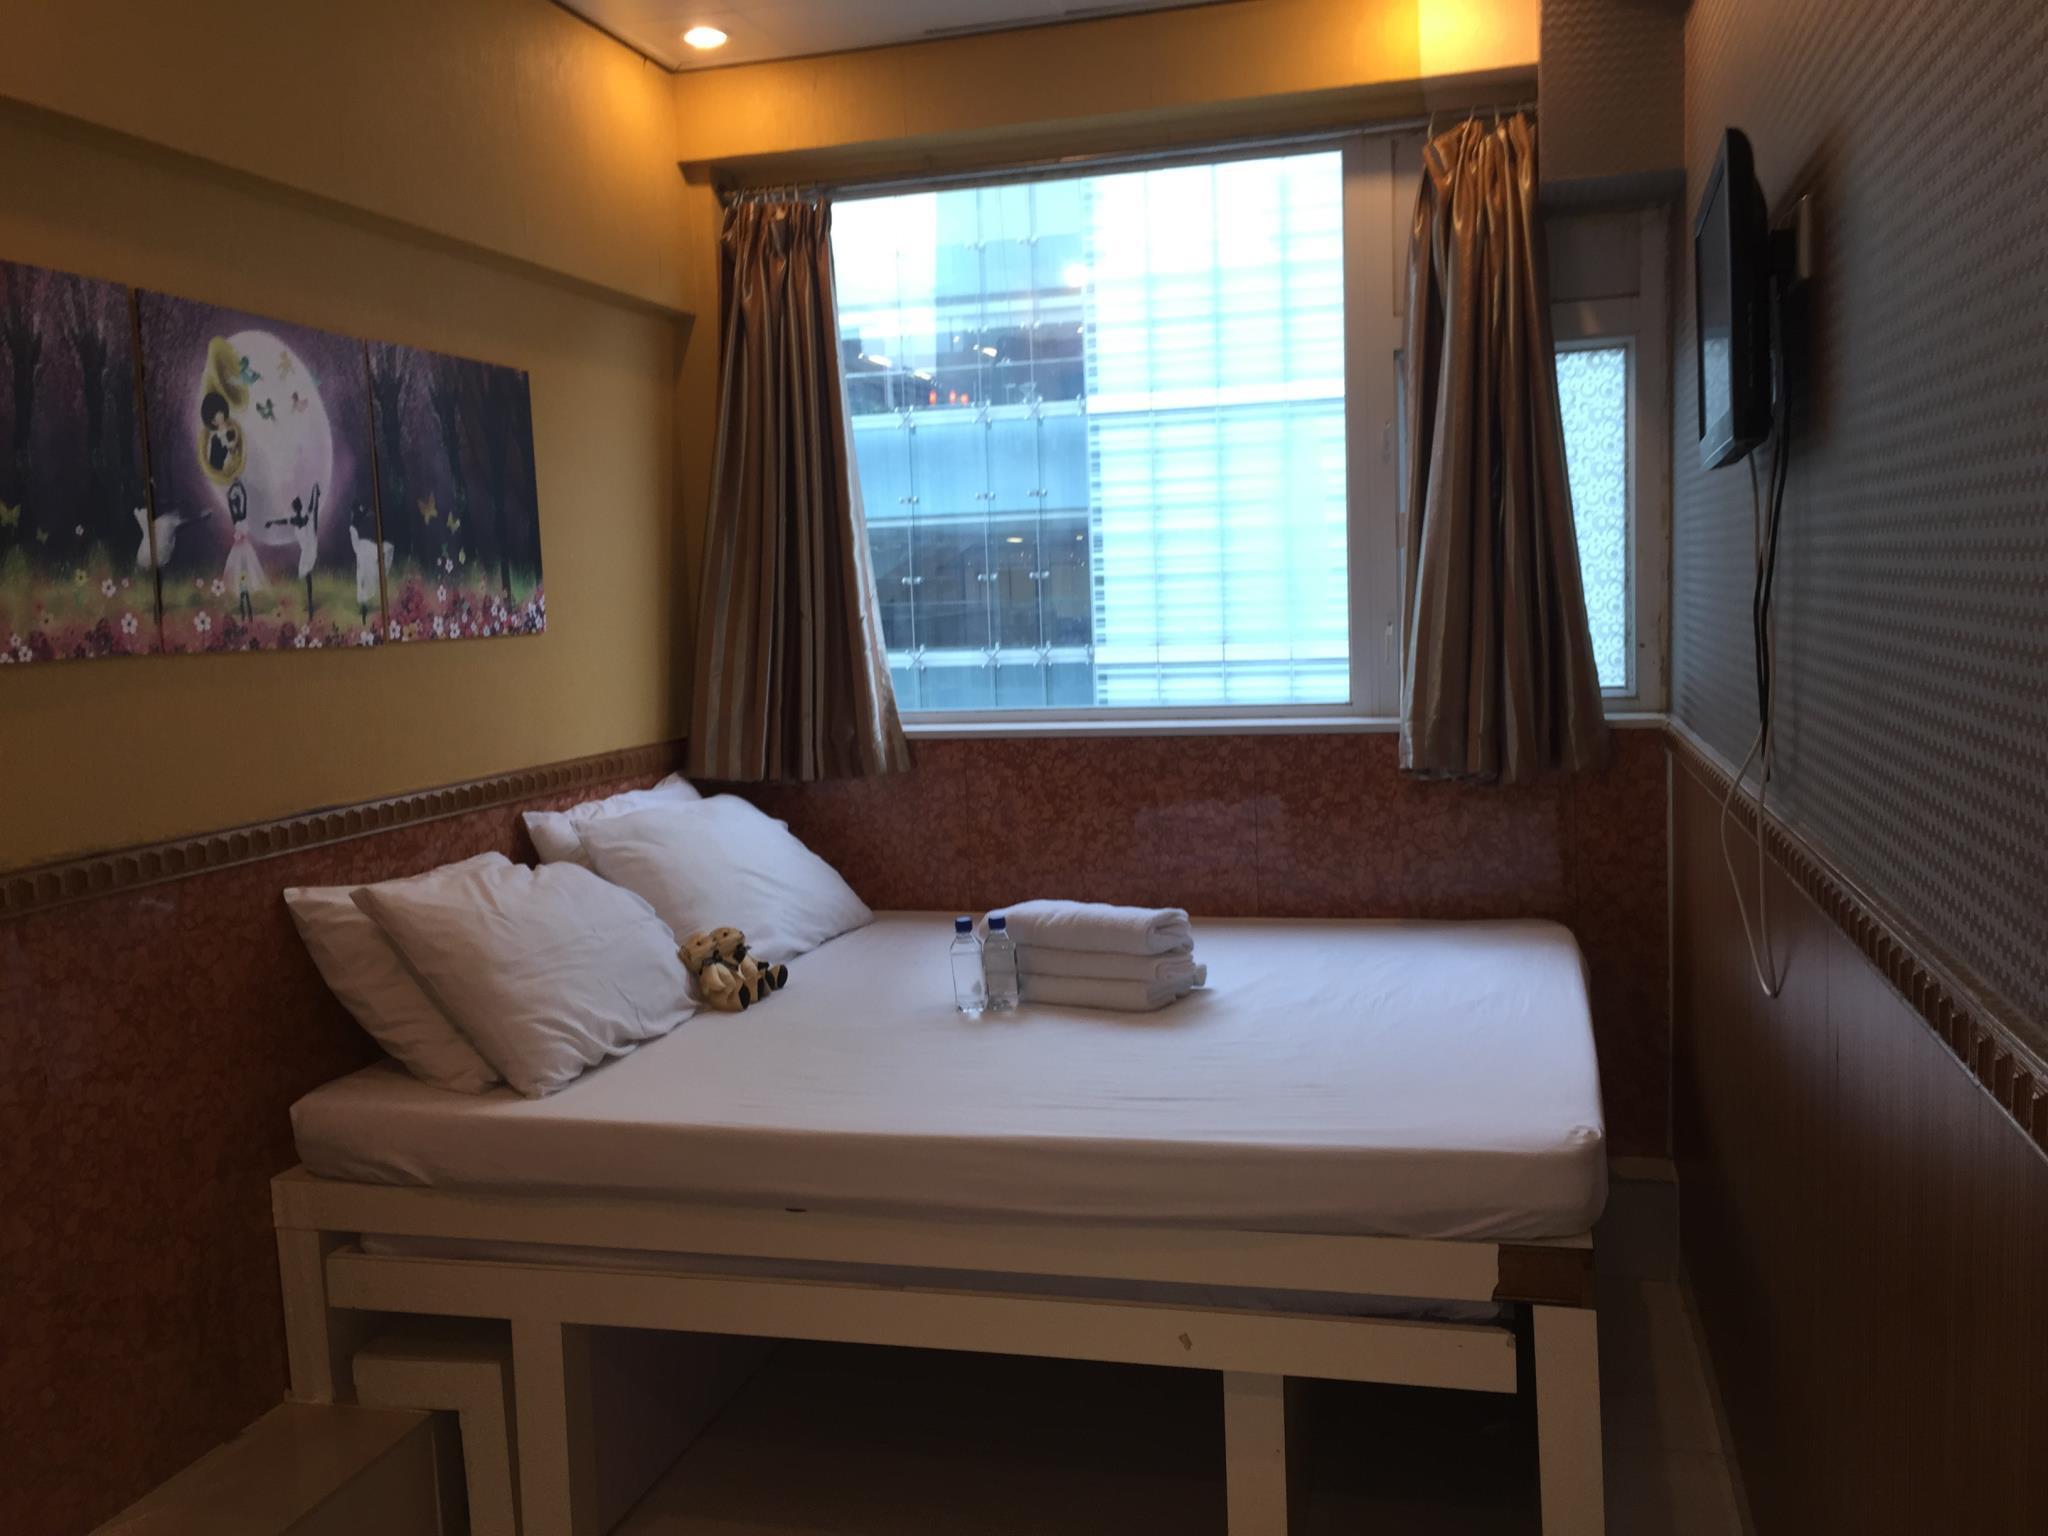 HK Peaceful Guesthouse